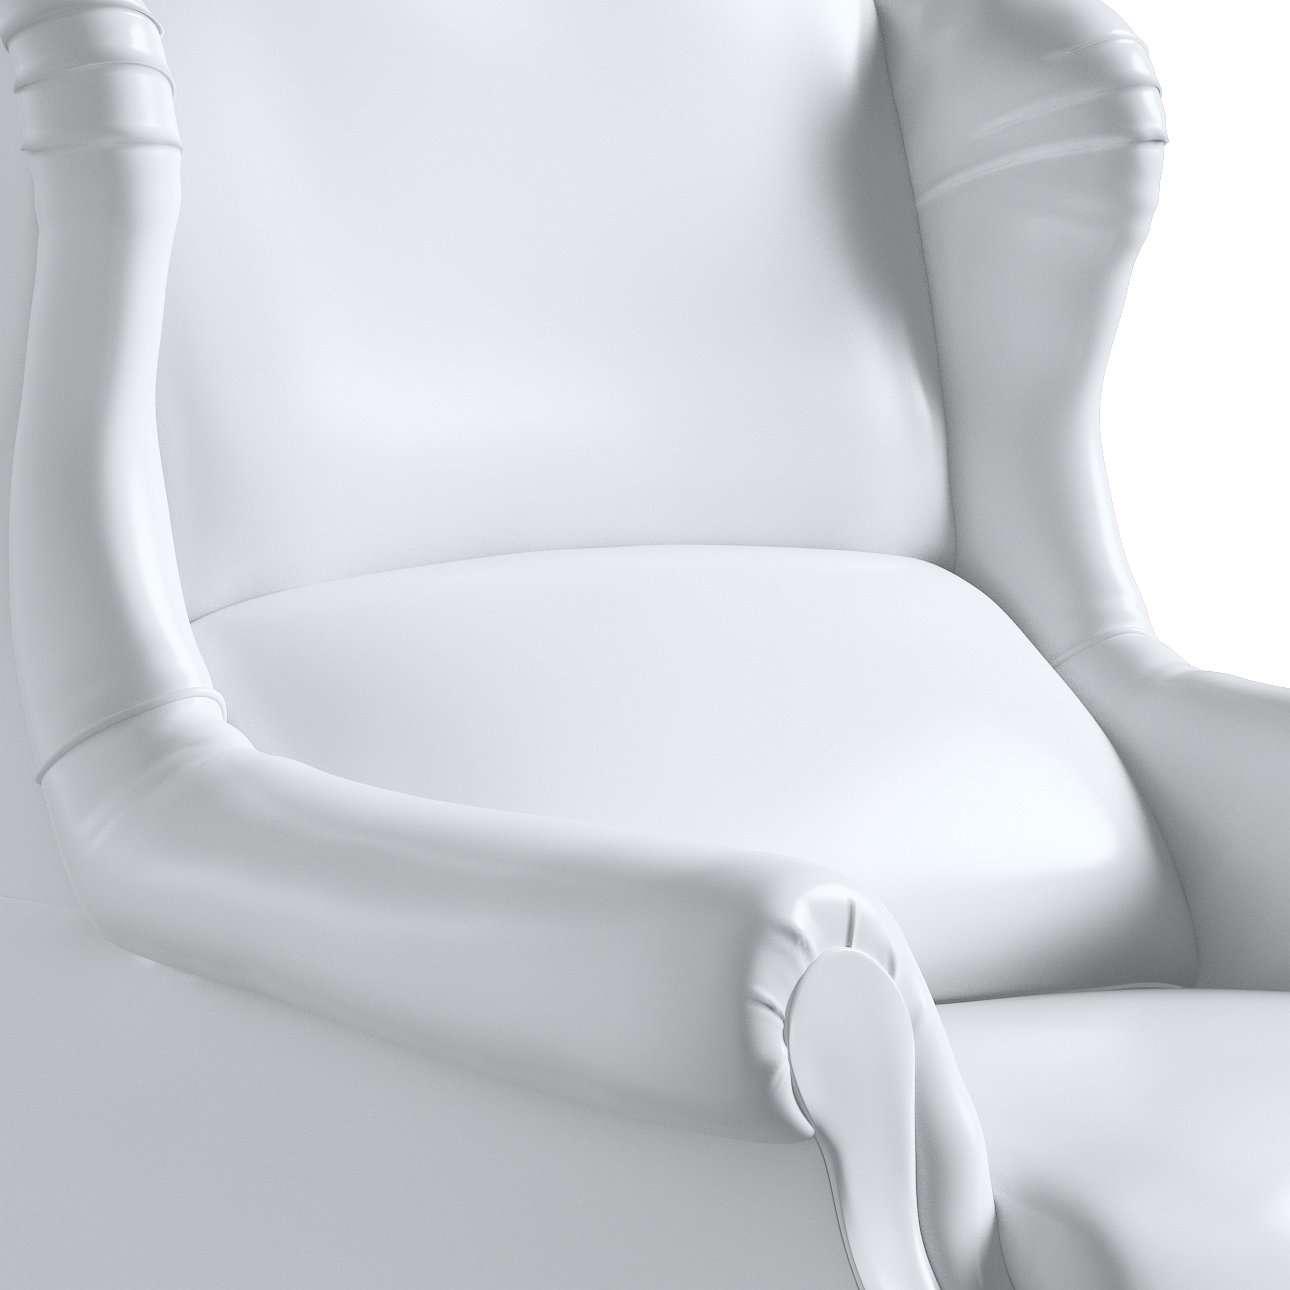 Fotel Unique w kolekcji Christmas, tkanina: 141-78